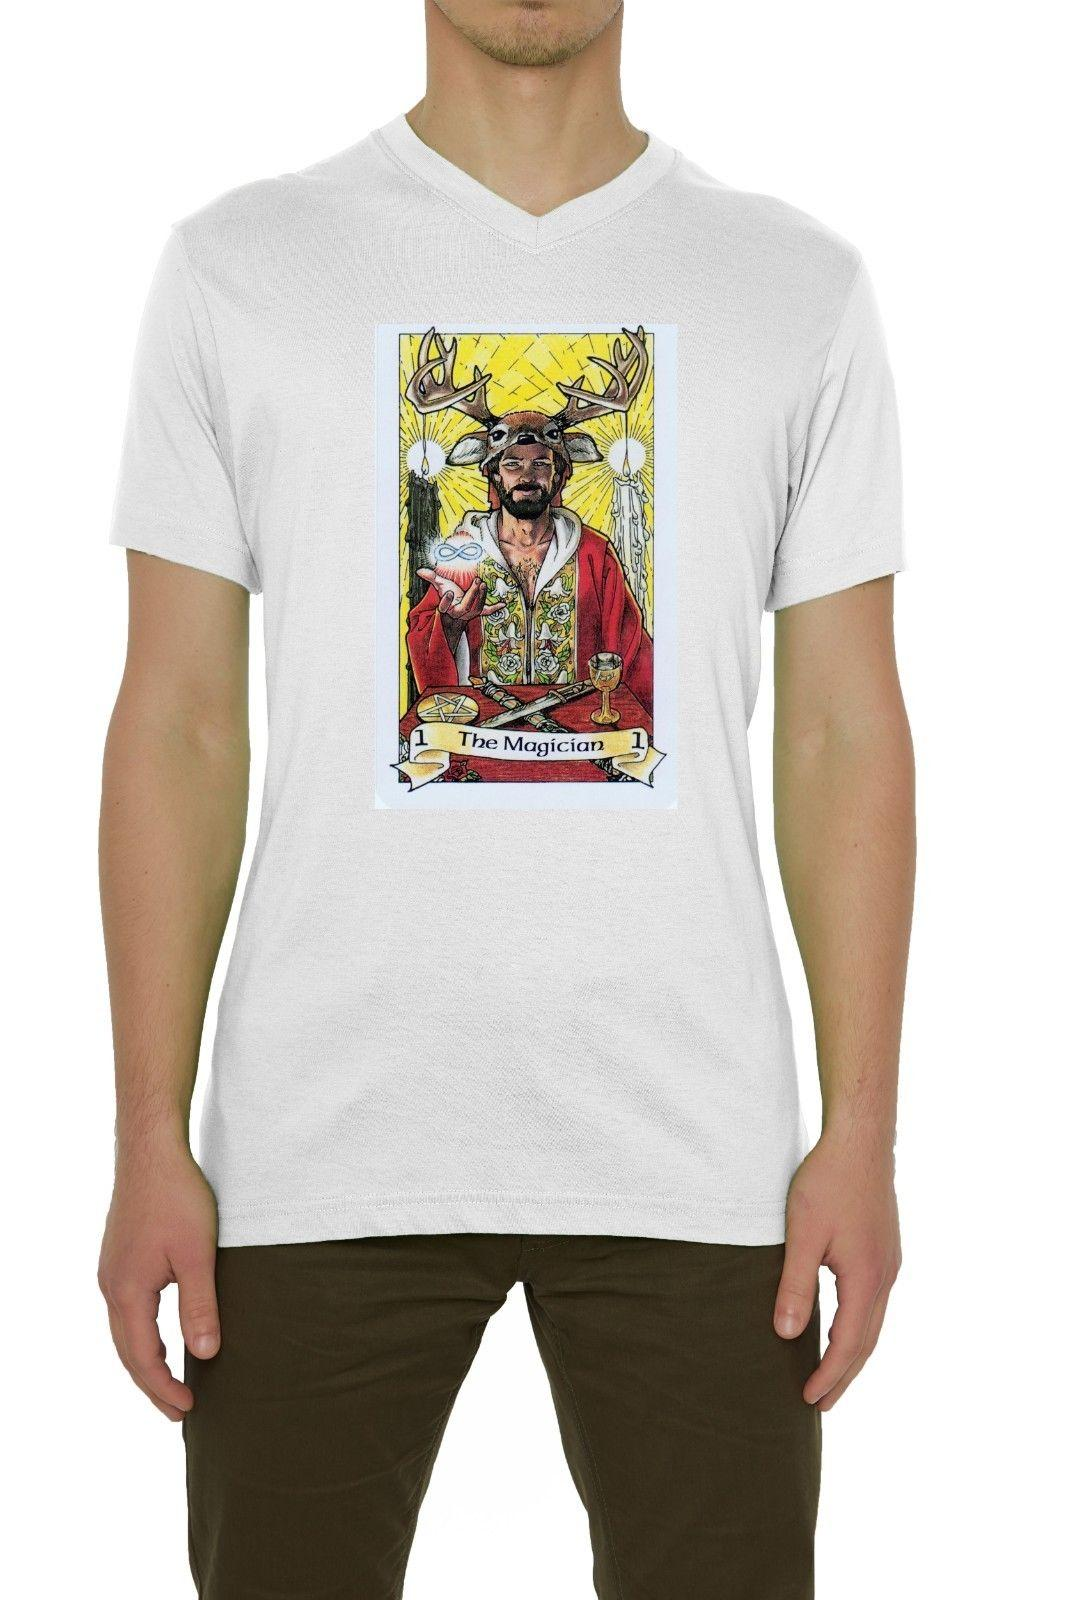 659d03c2ca83ae The Magician Tarot Card Art Logo Men S T Shirt V Neck White S XXL Mens  Pride Dark T Shirt White Black Grey Red Trousers Tshirt Best Designer T  Shirts Funny ...